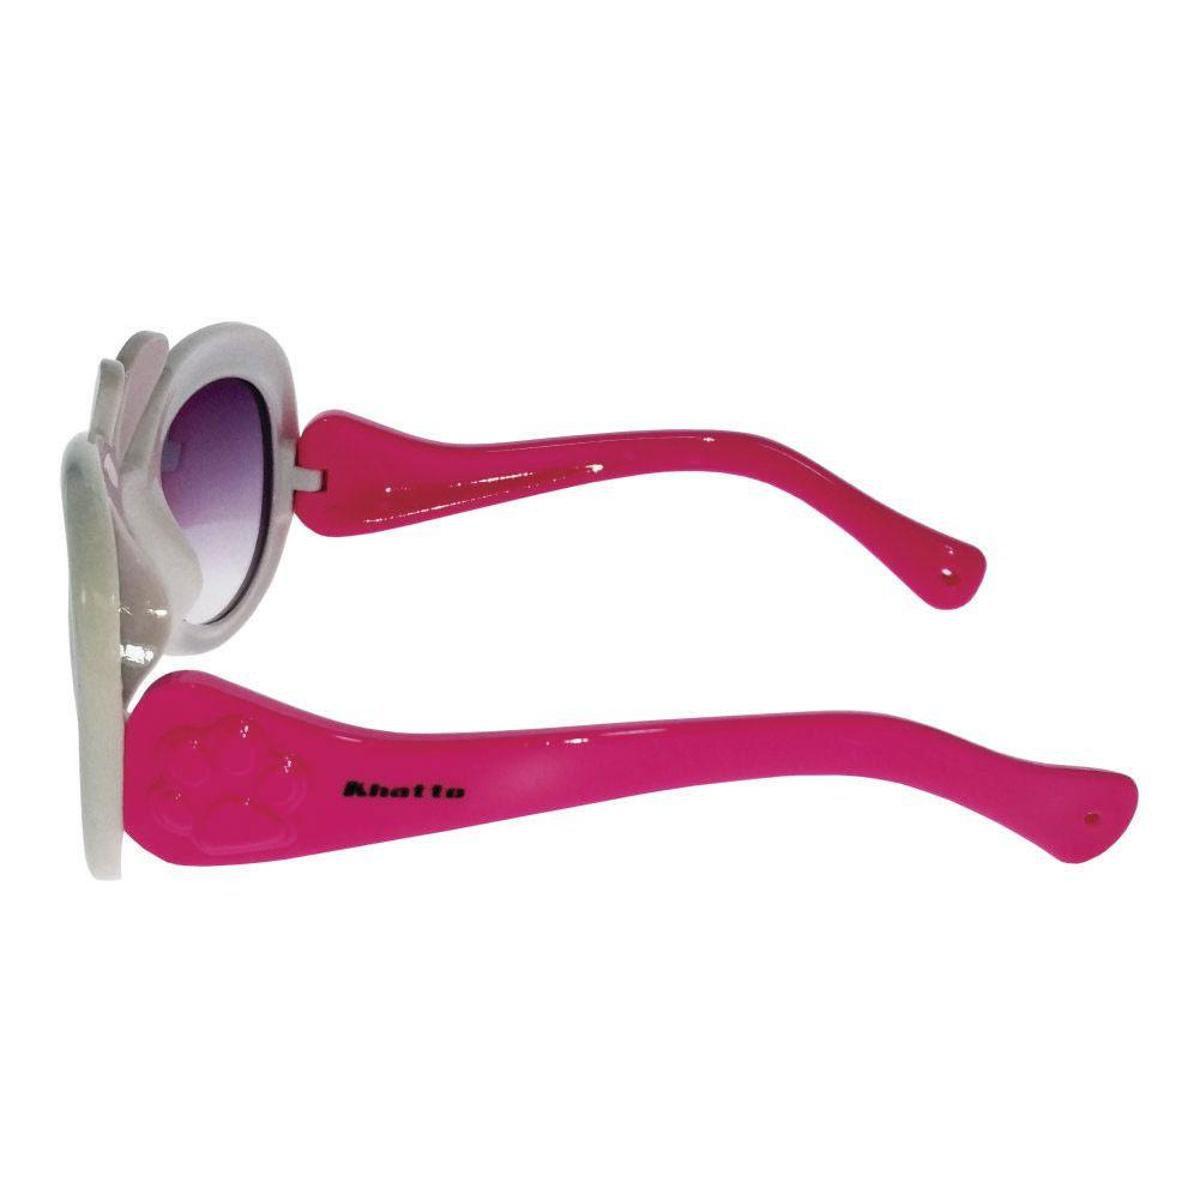 efcdfe376f0cd Óculos de Sol Khatto Infantil Rabbit Feminino - Compre Agora   Netshoes